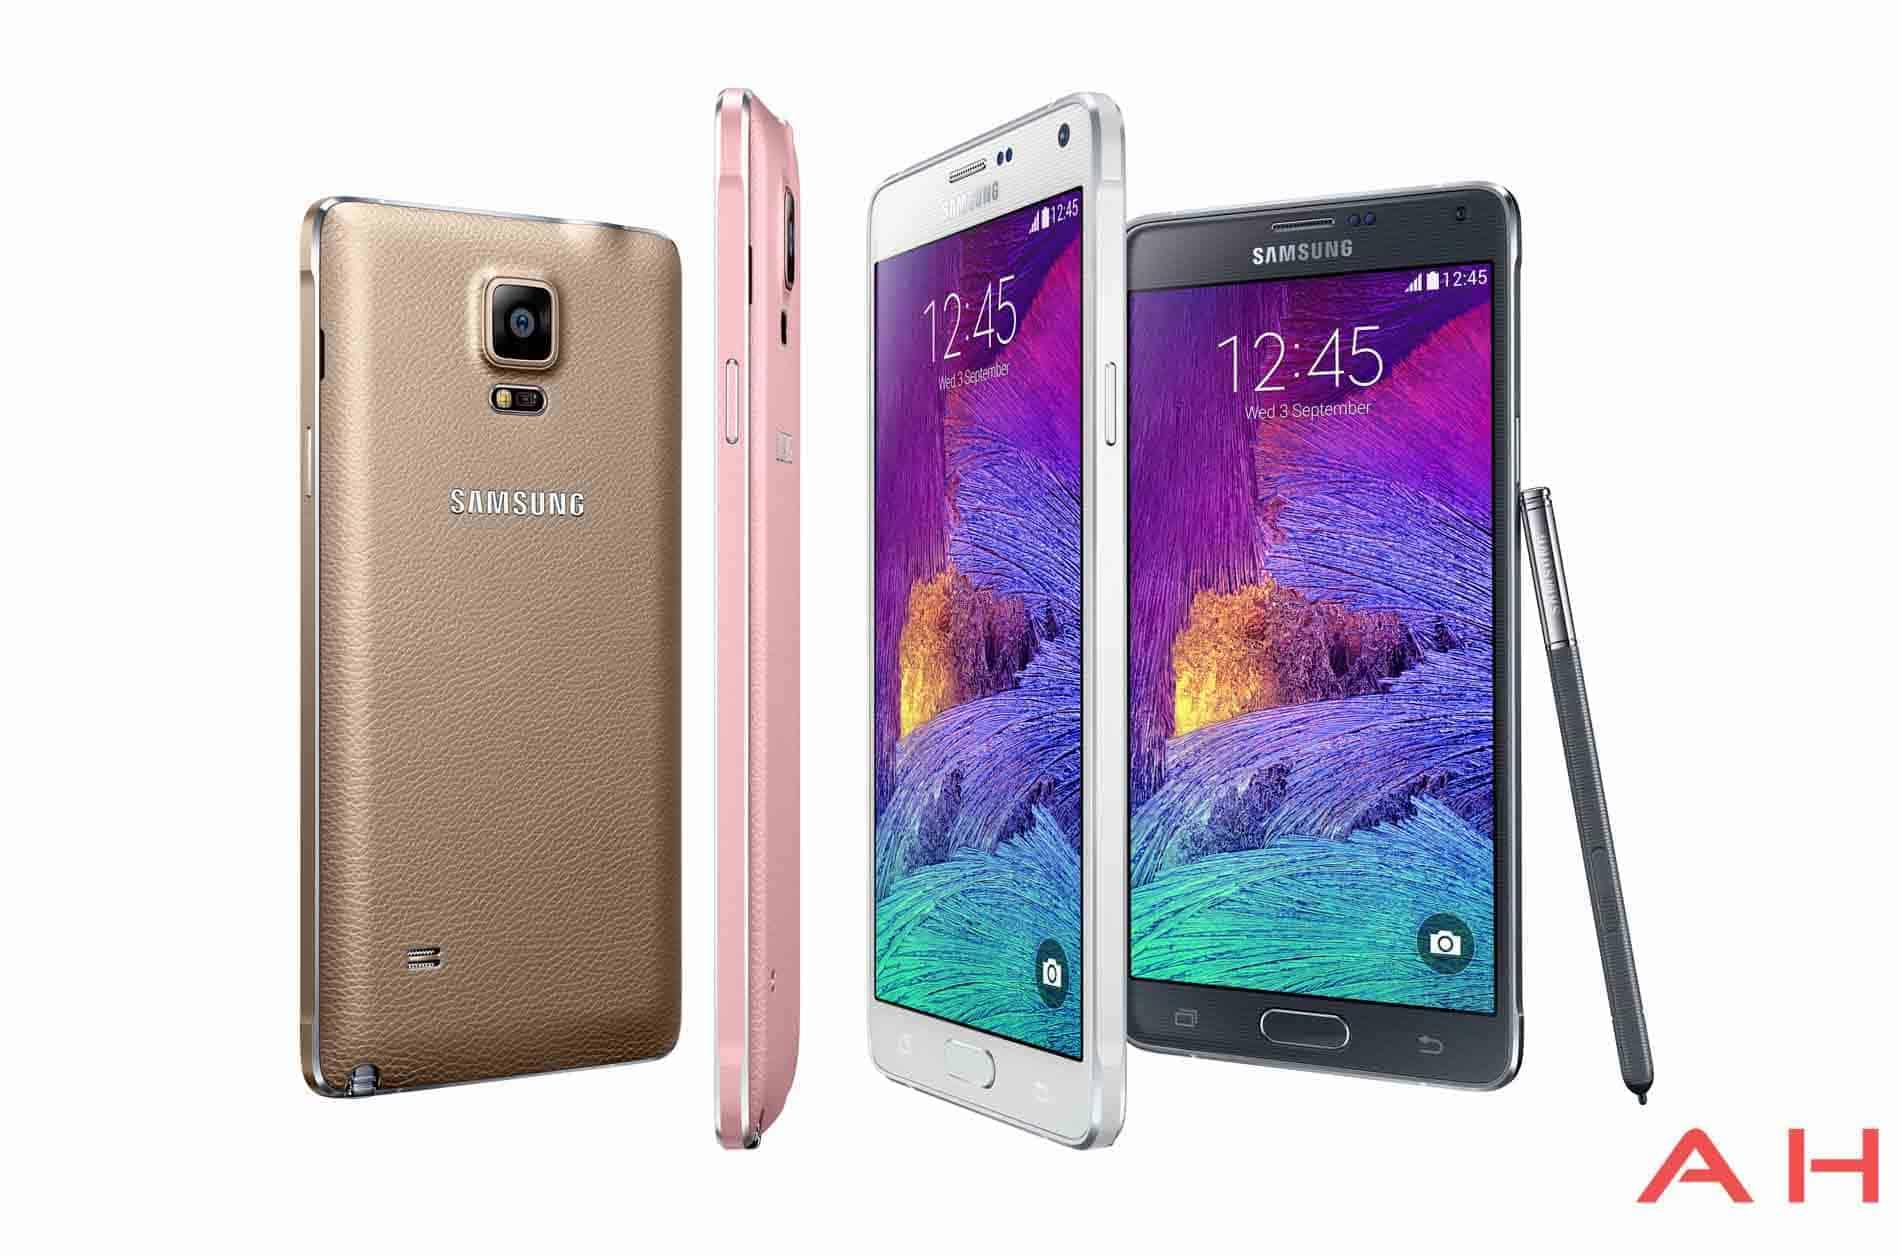 Samsung Galaxy Note 4 AH 16